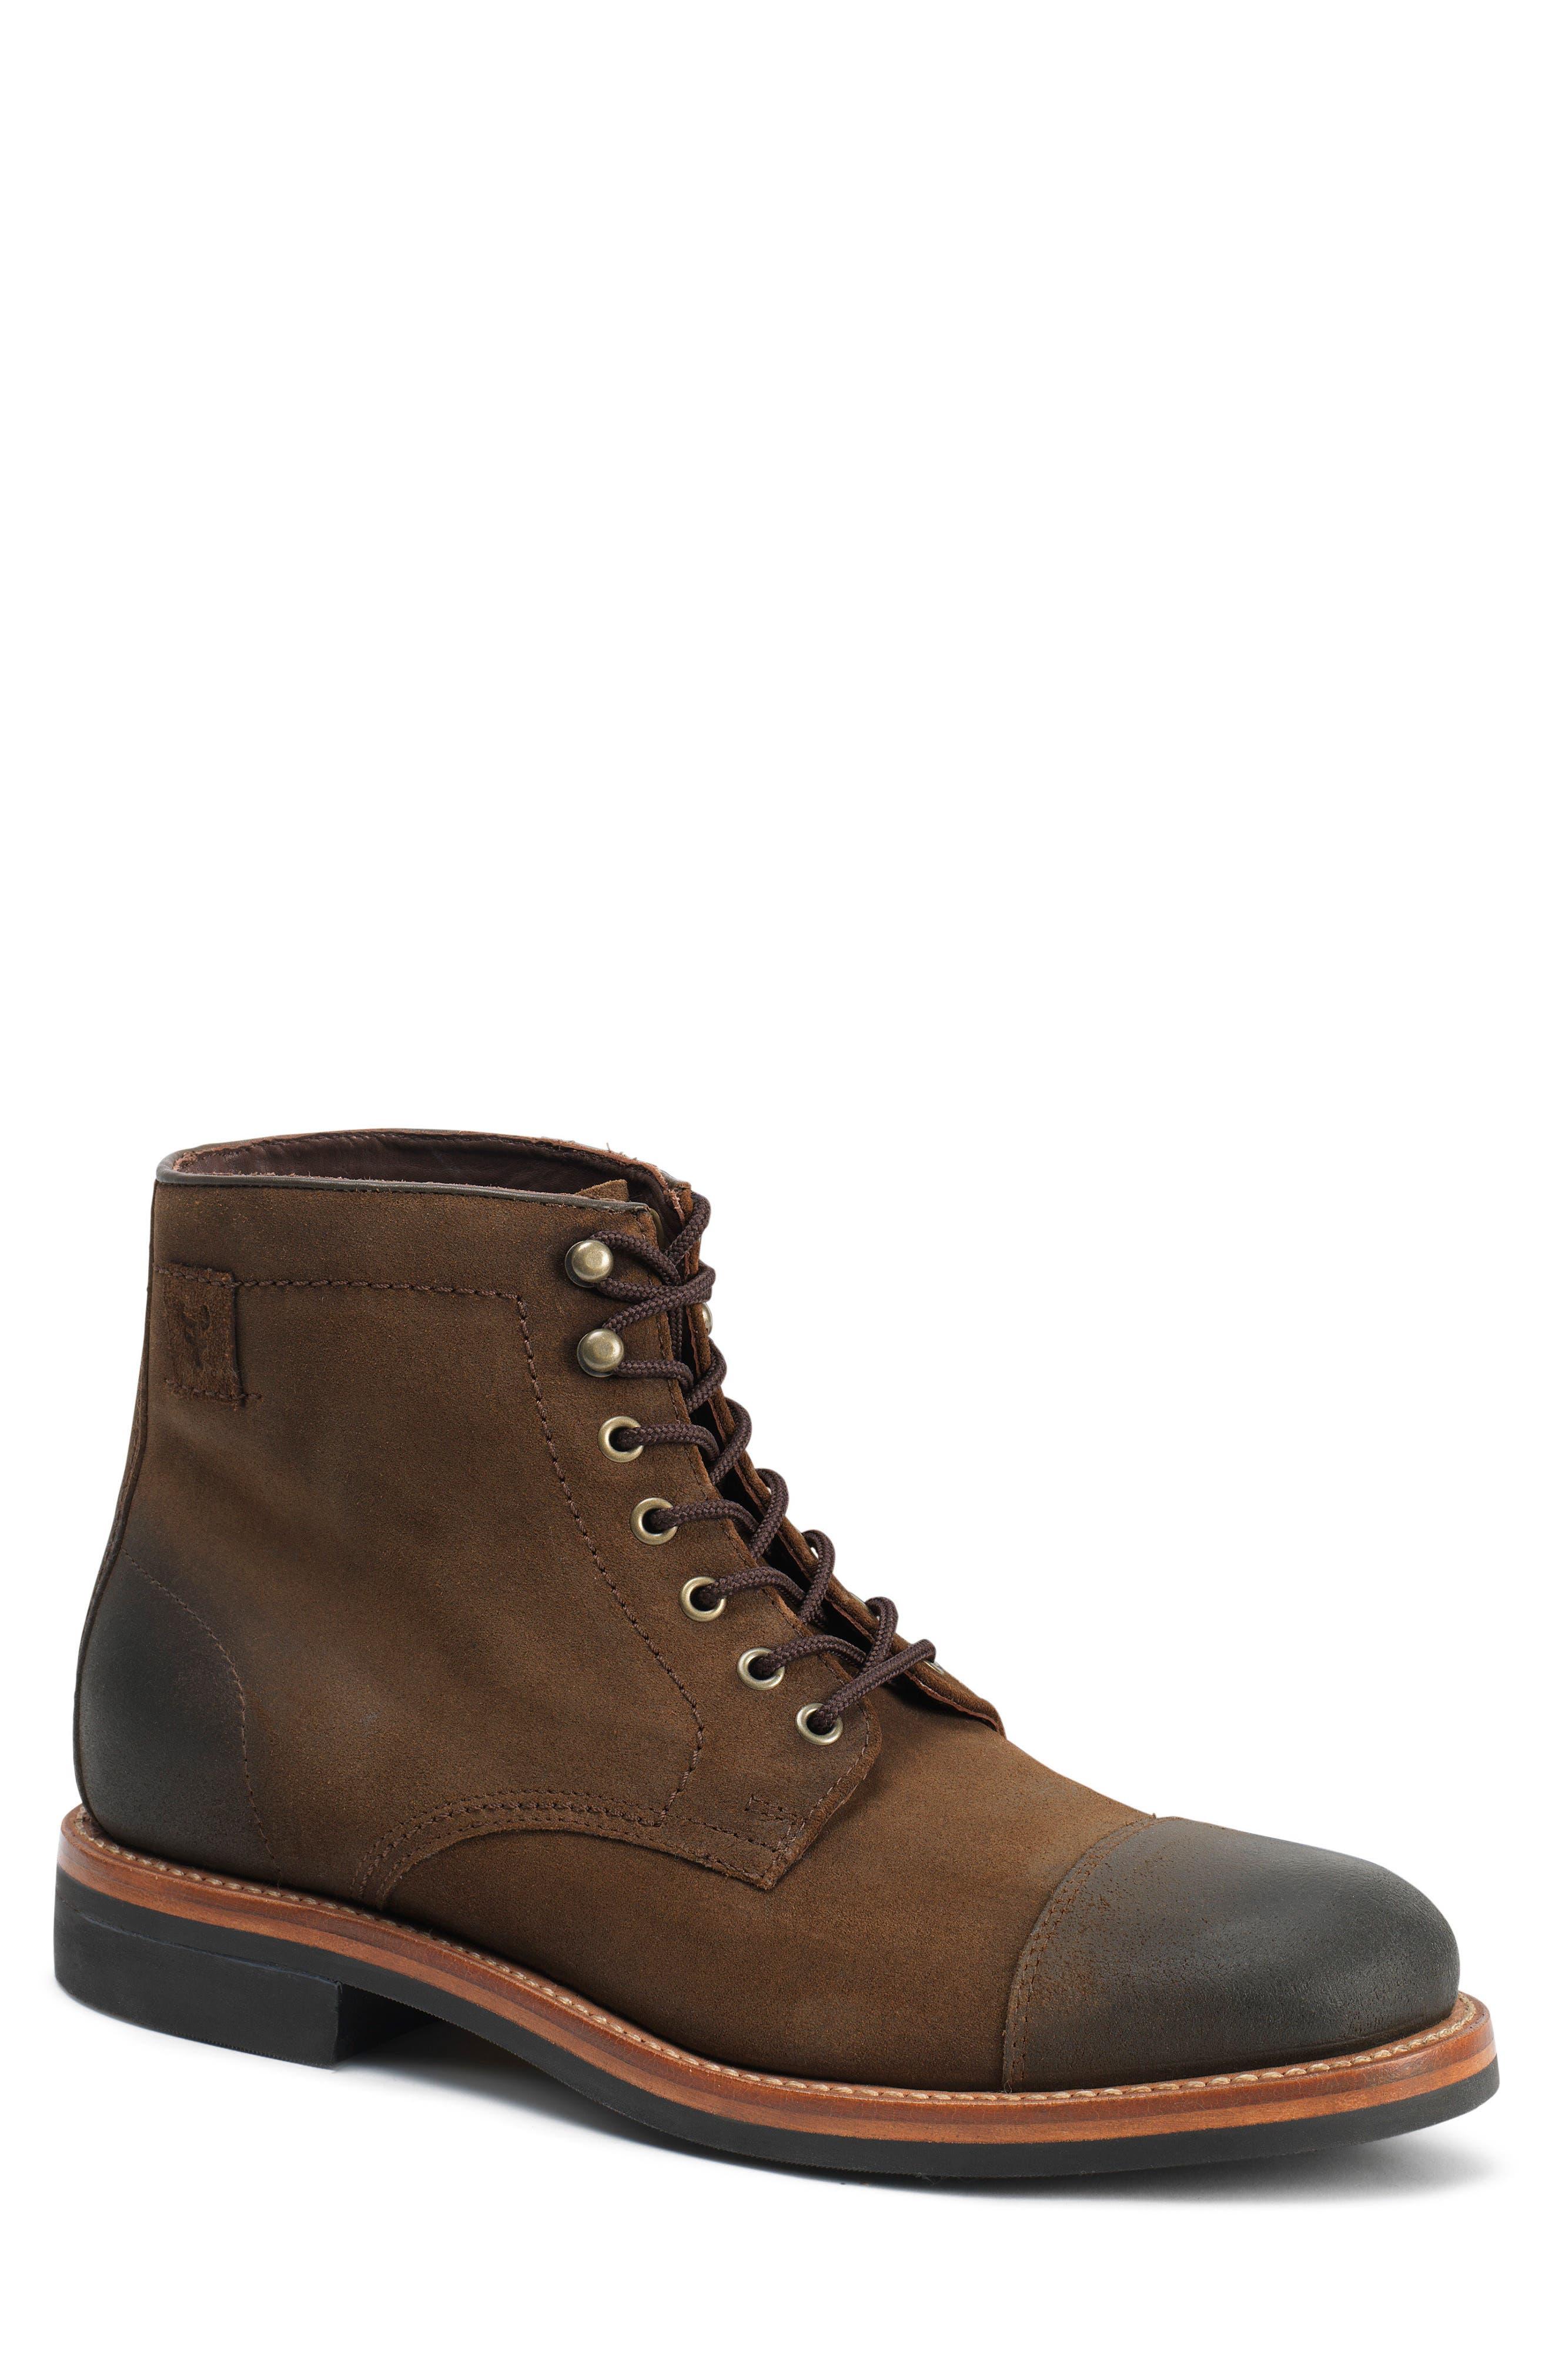 Ike Plain Toe Boot,                         Main,                         color, 200